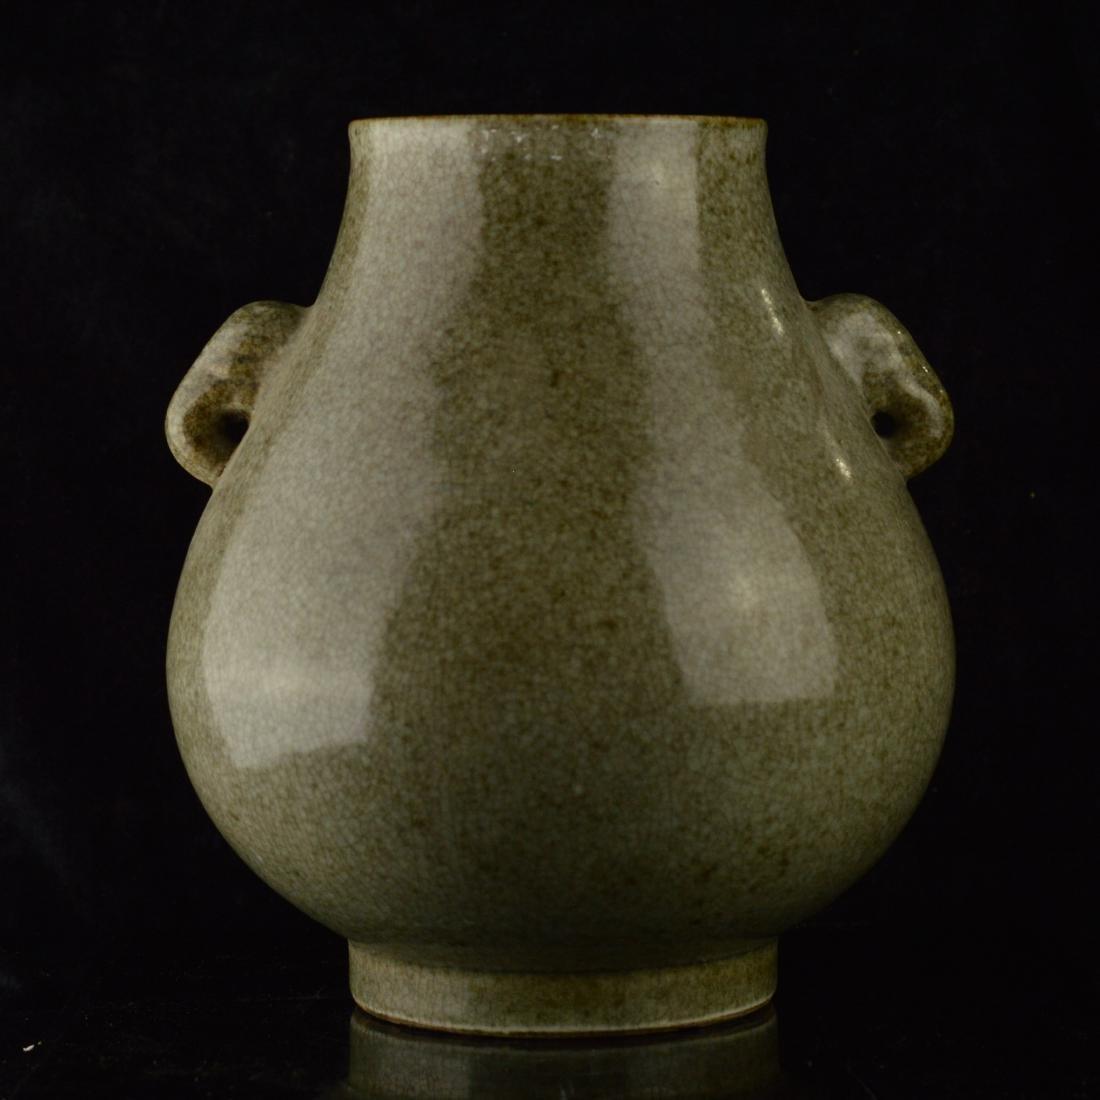 Porcelain Dual ear vase